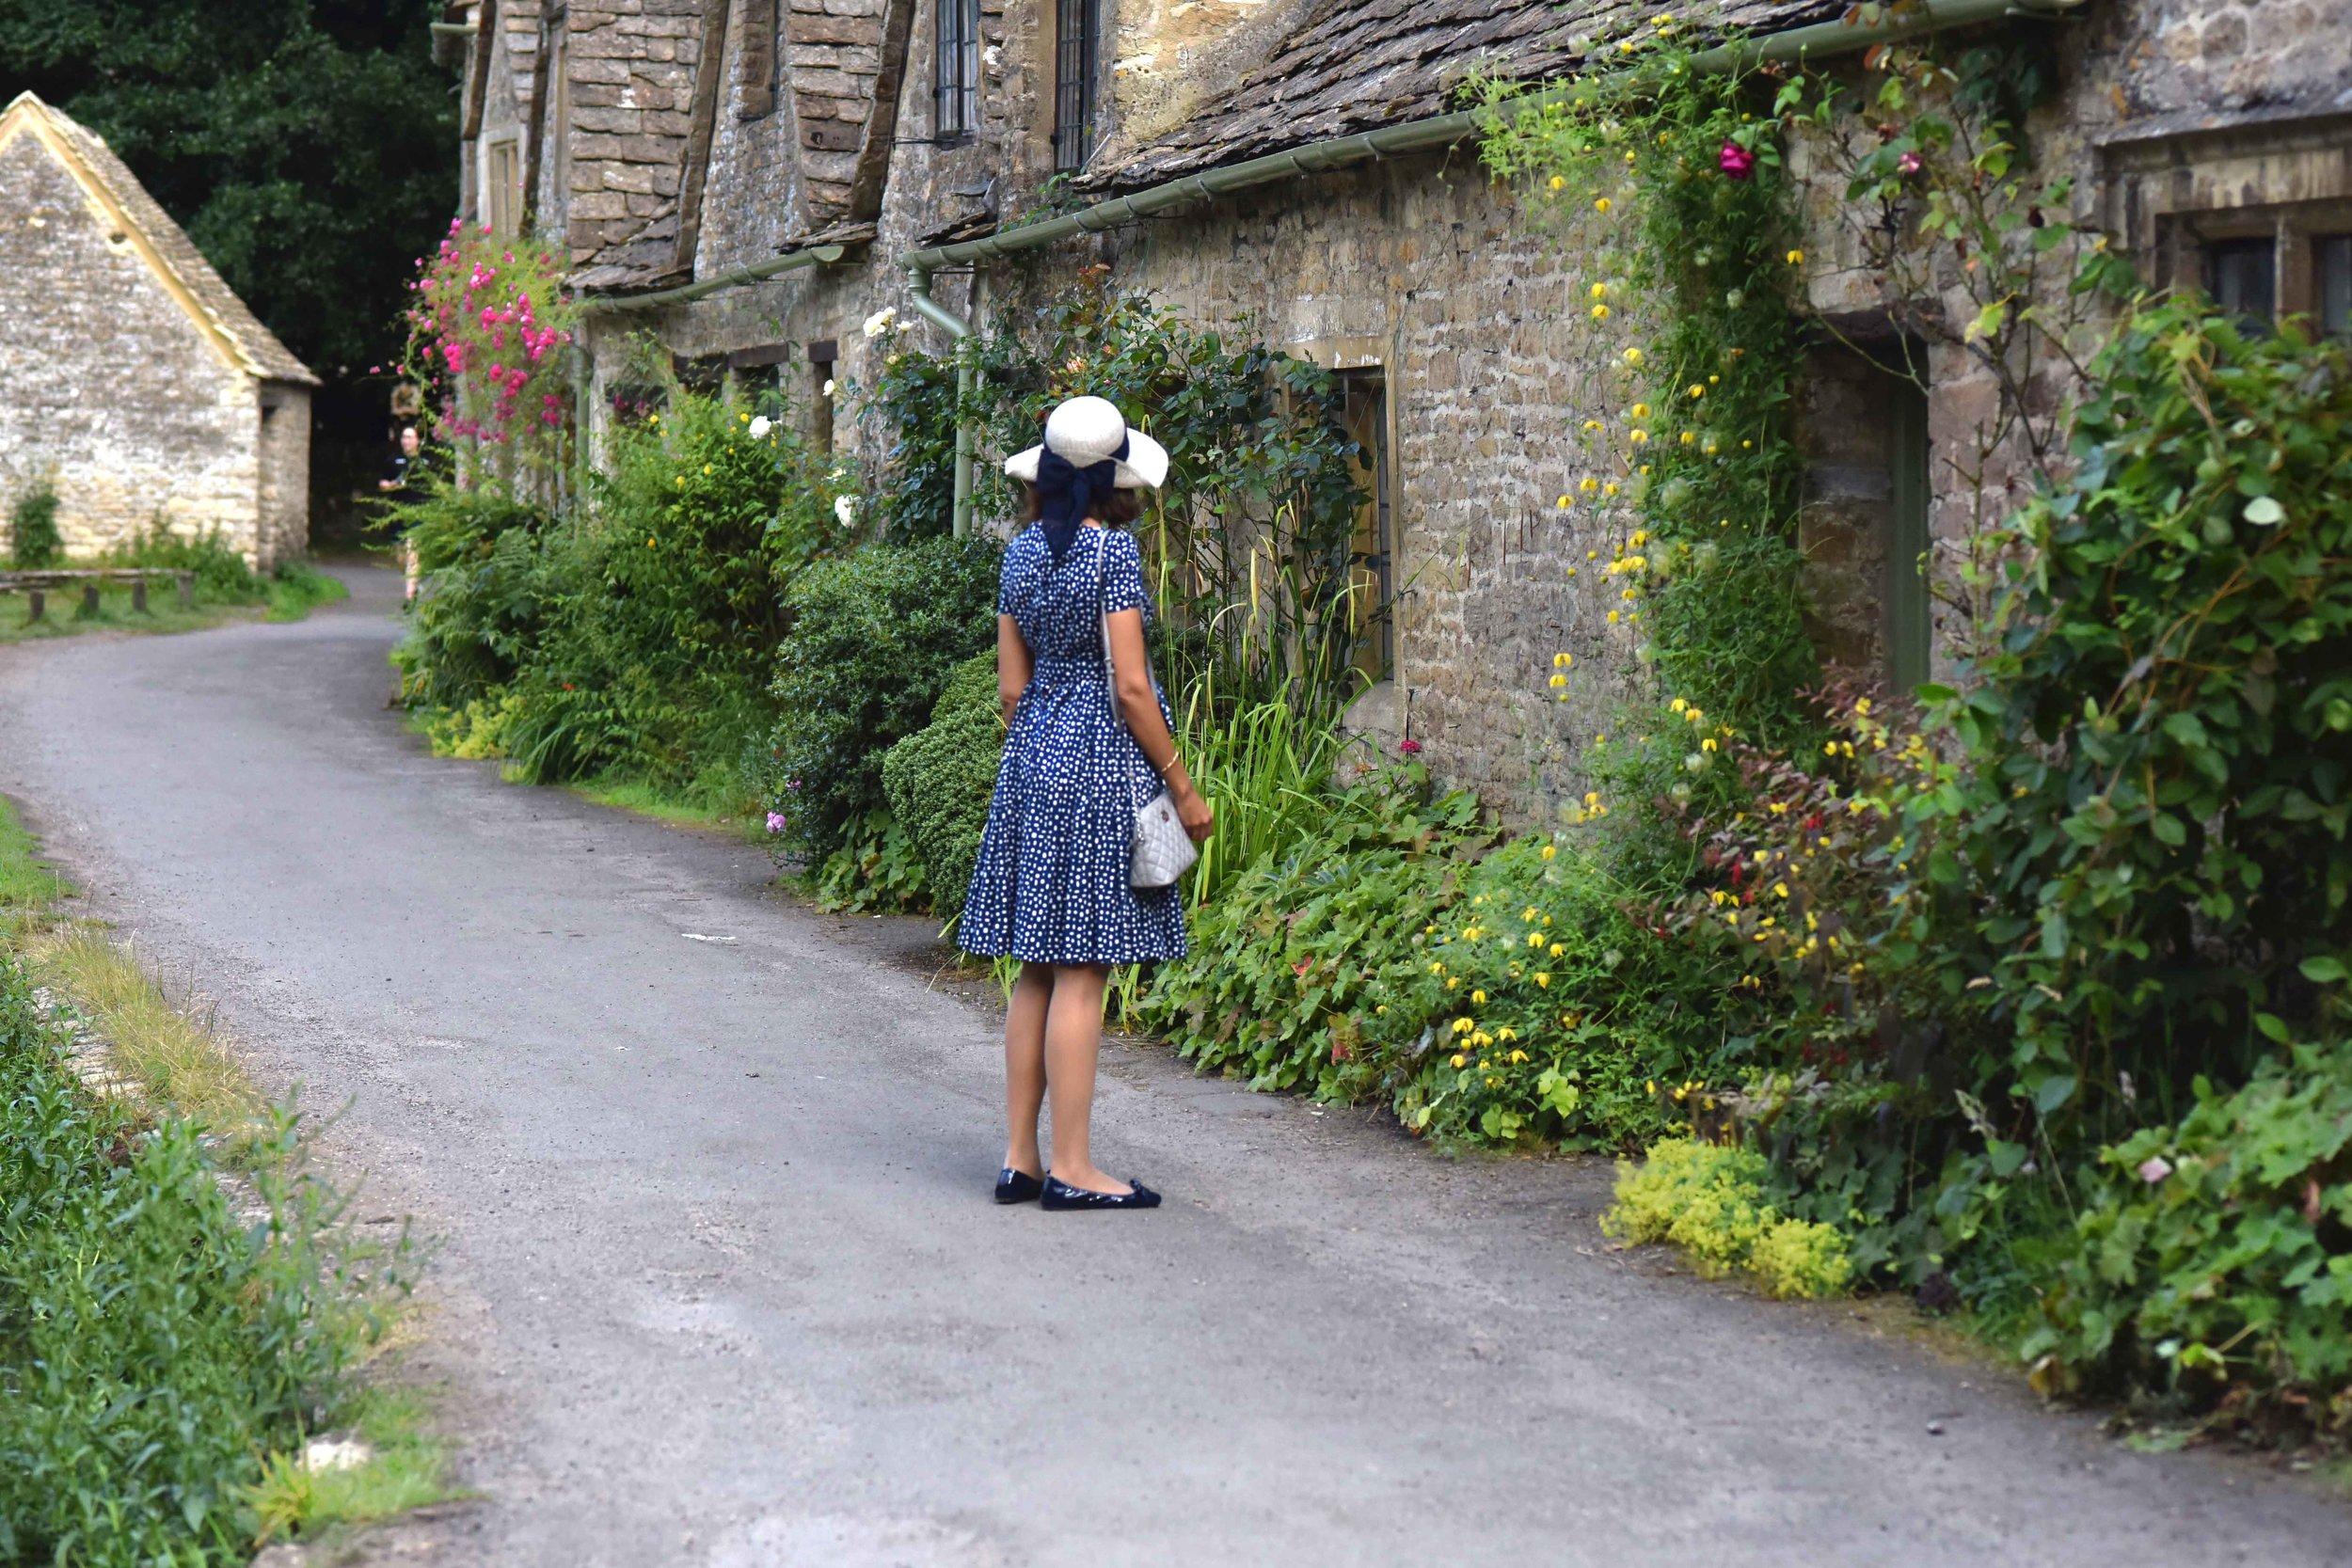 Prada dress, Prada ballet flats, Michael Kors bag, Cotswold stone cottages, Arlington Row, Bibury, Cotswold, England. Image©sourcingstyle.com